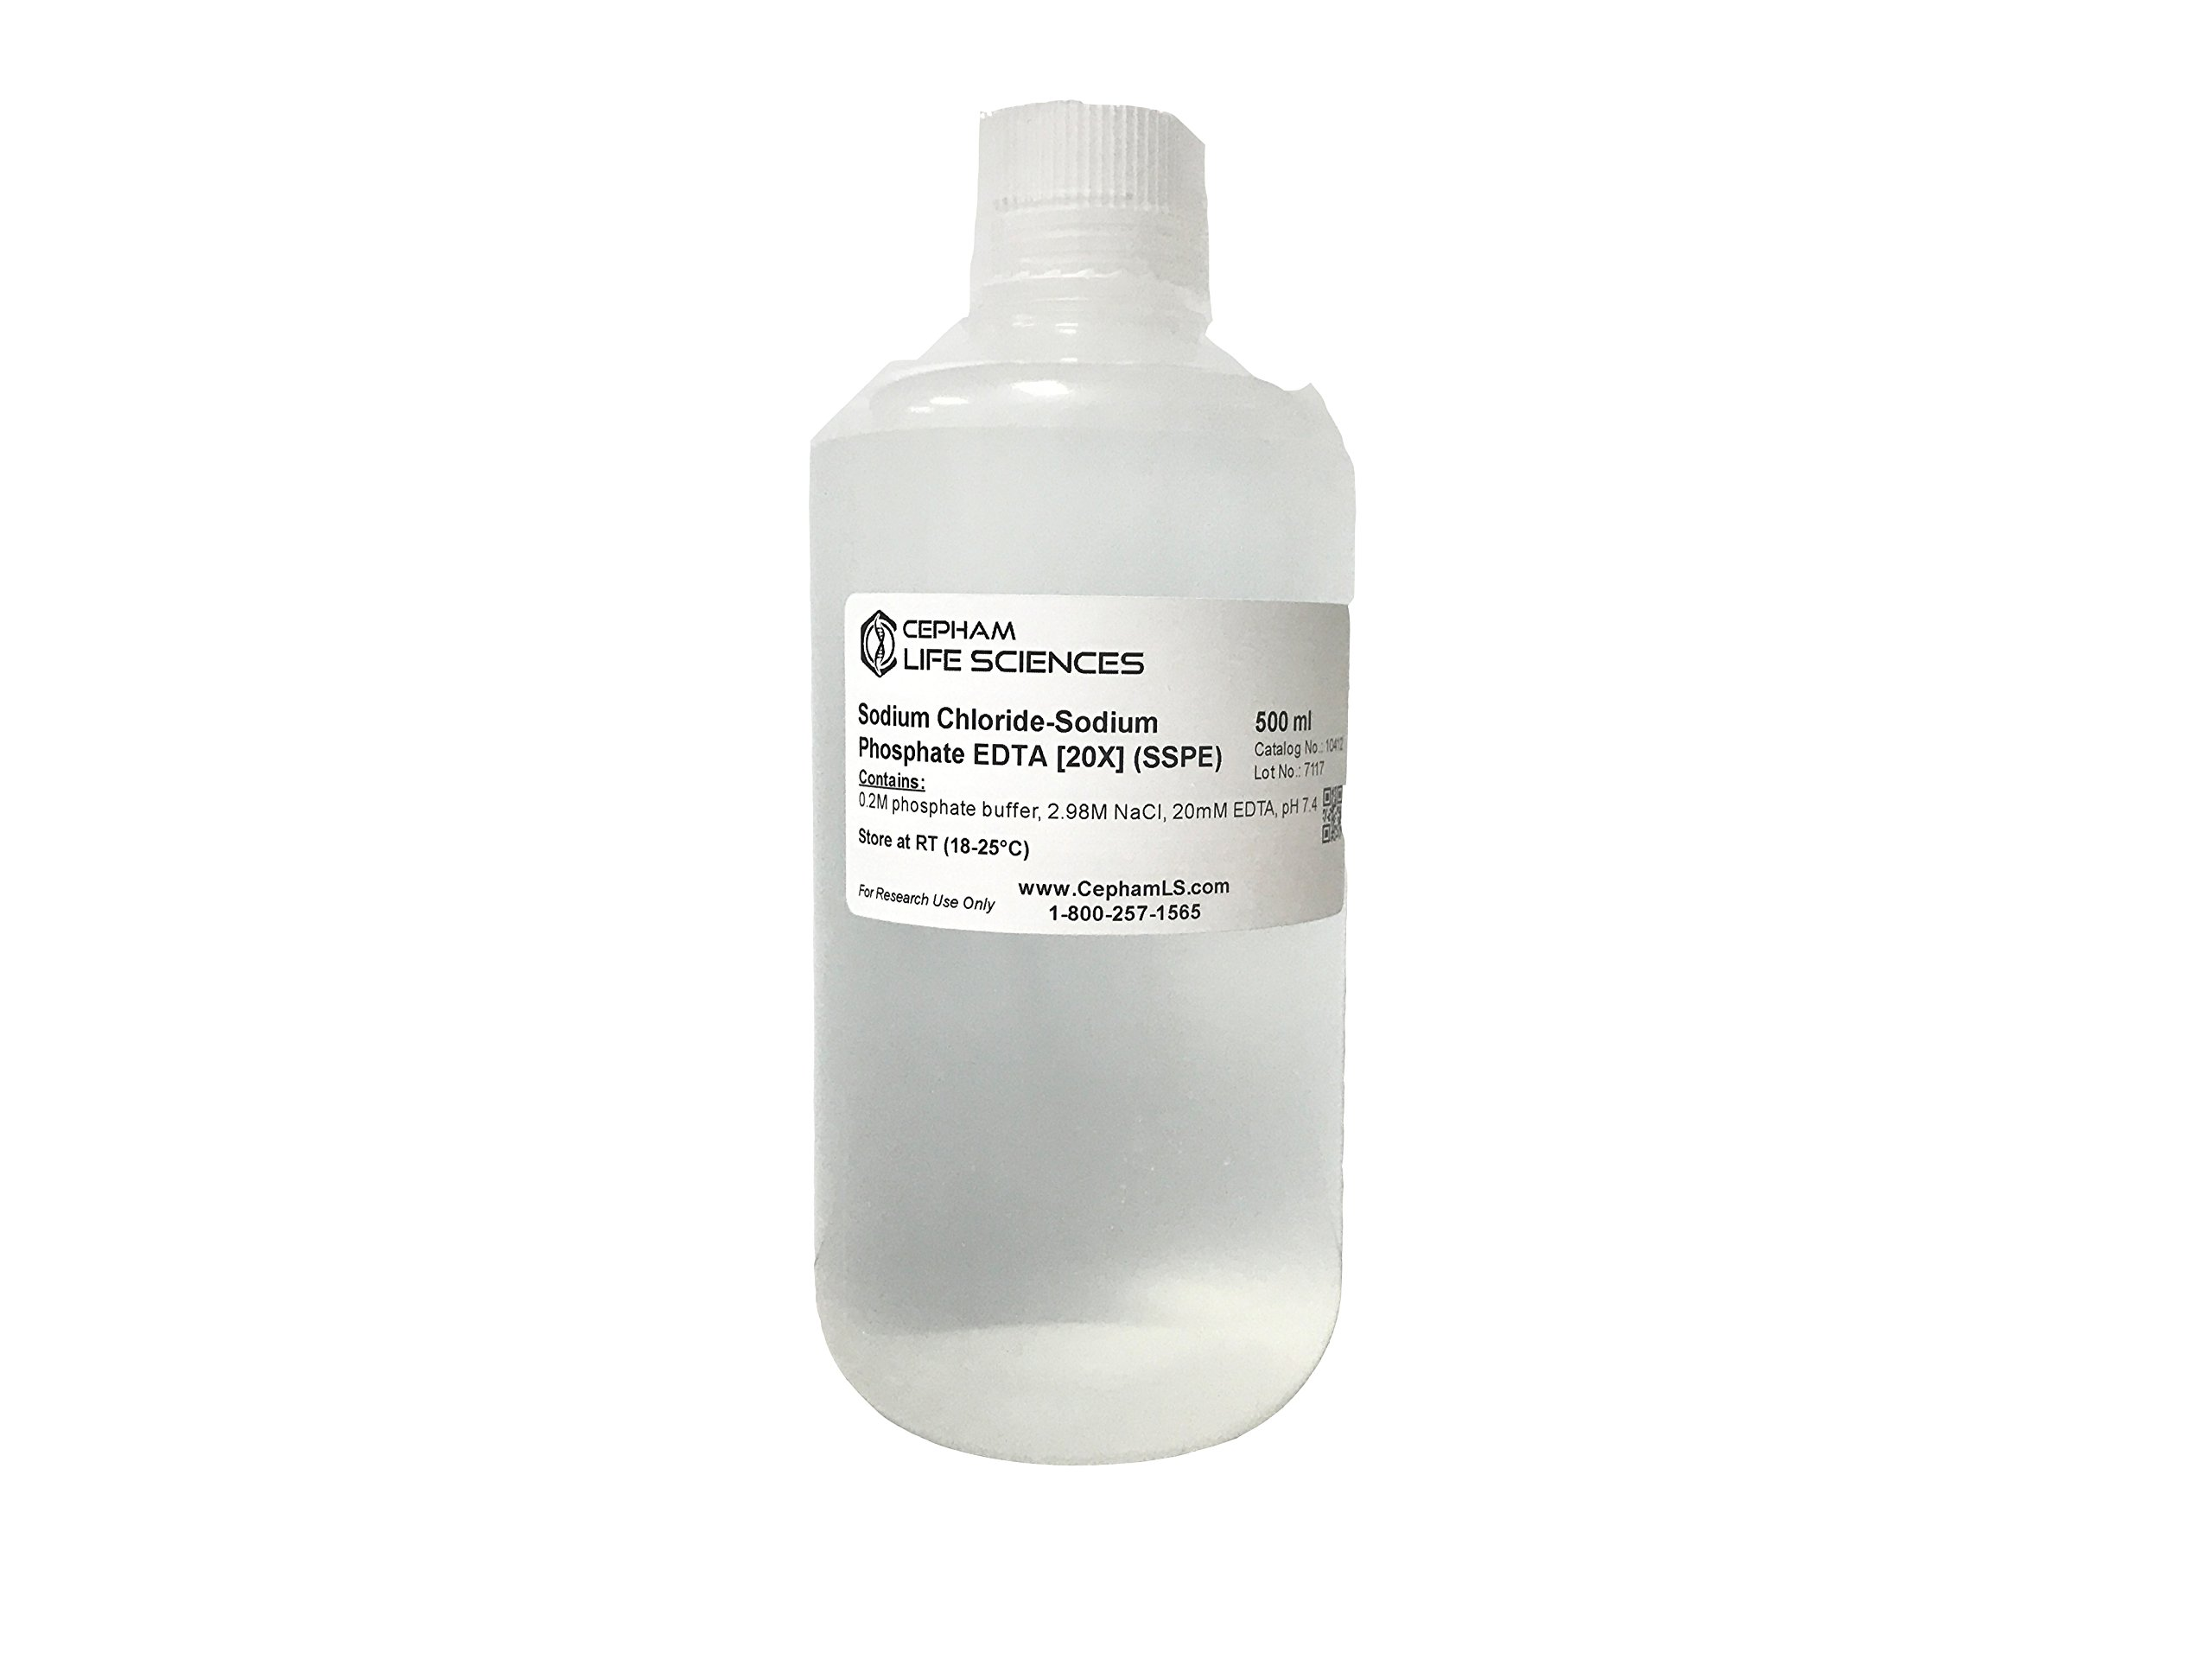 SSPE [20X]; Sodium Chloride-Sodium Phosphate-EDTA (0.2M phosphate buffer, 2.98M NaCl, 20mM EDTA, pH7.4) - 500 ml